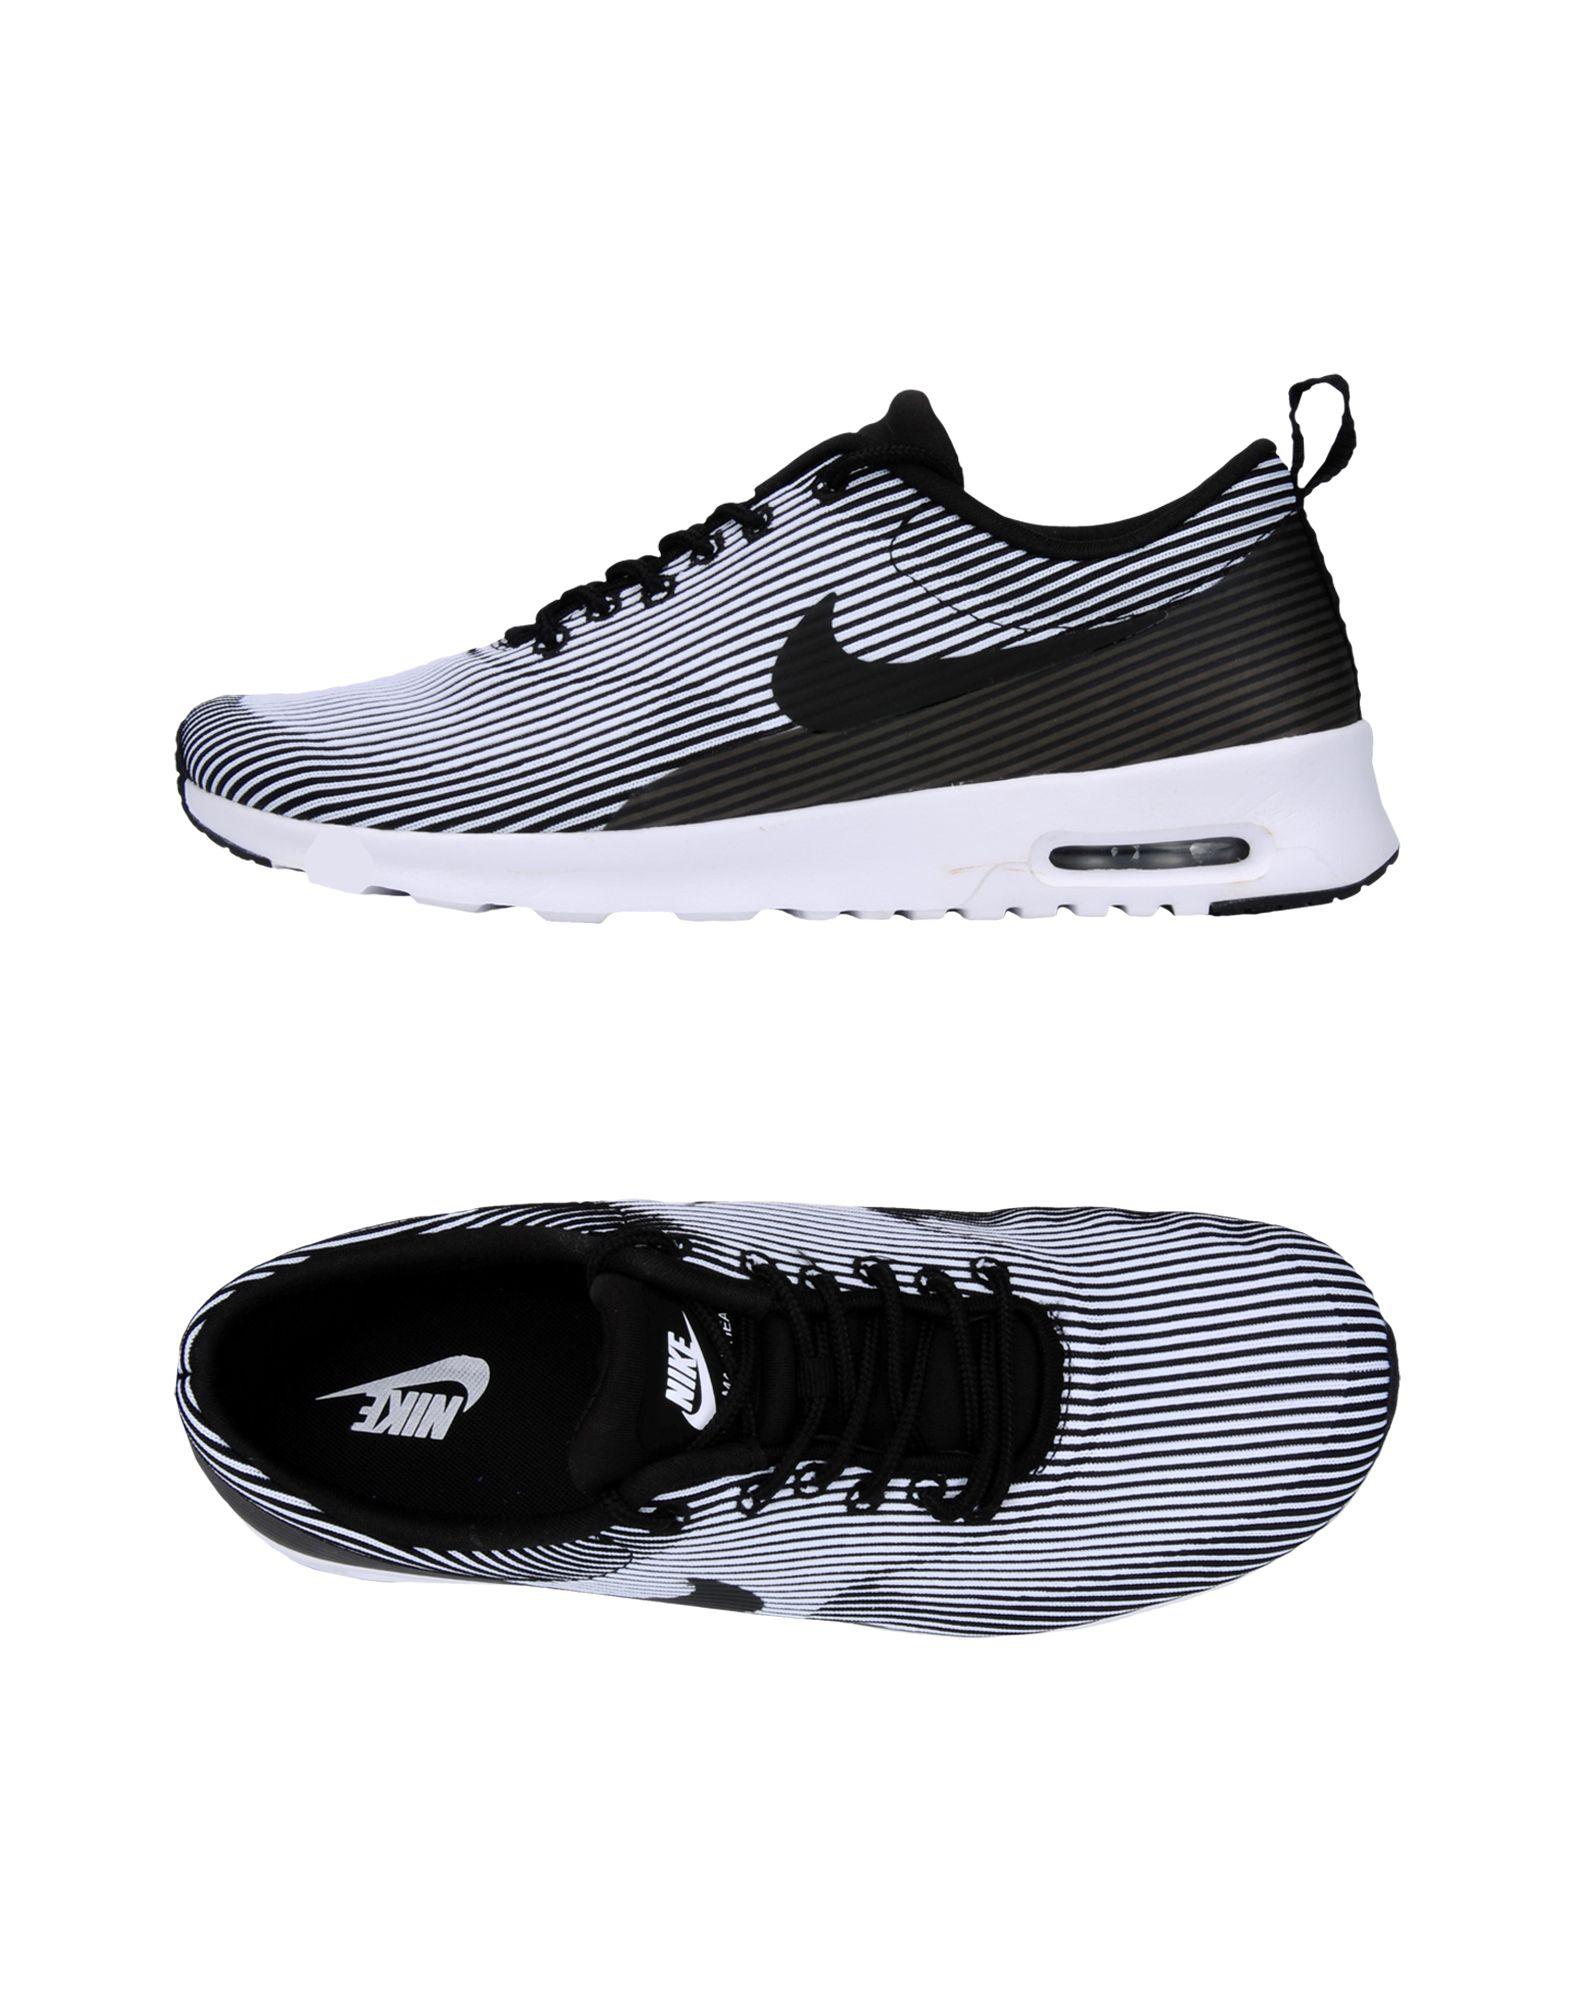 Nike W Nike Air Max Thea Kjcrd  44998324XO Gute Schuhe Qualität beliebte Schuhe Gute abfd33